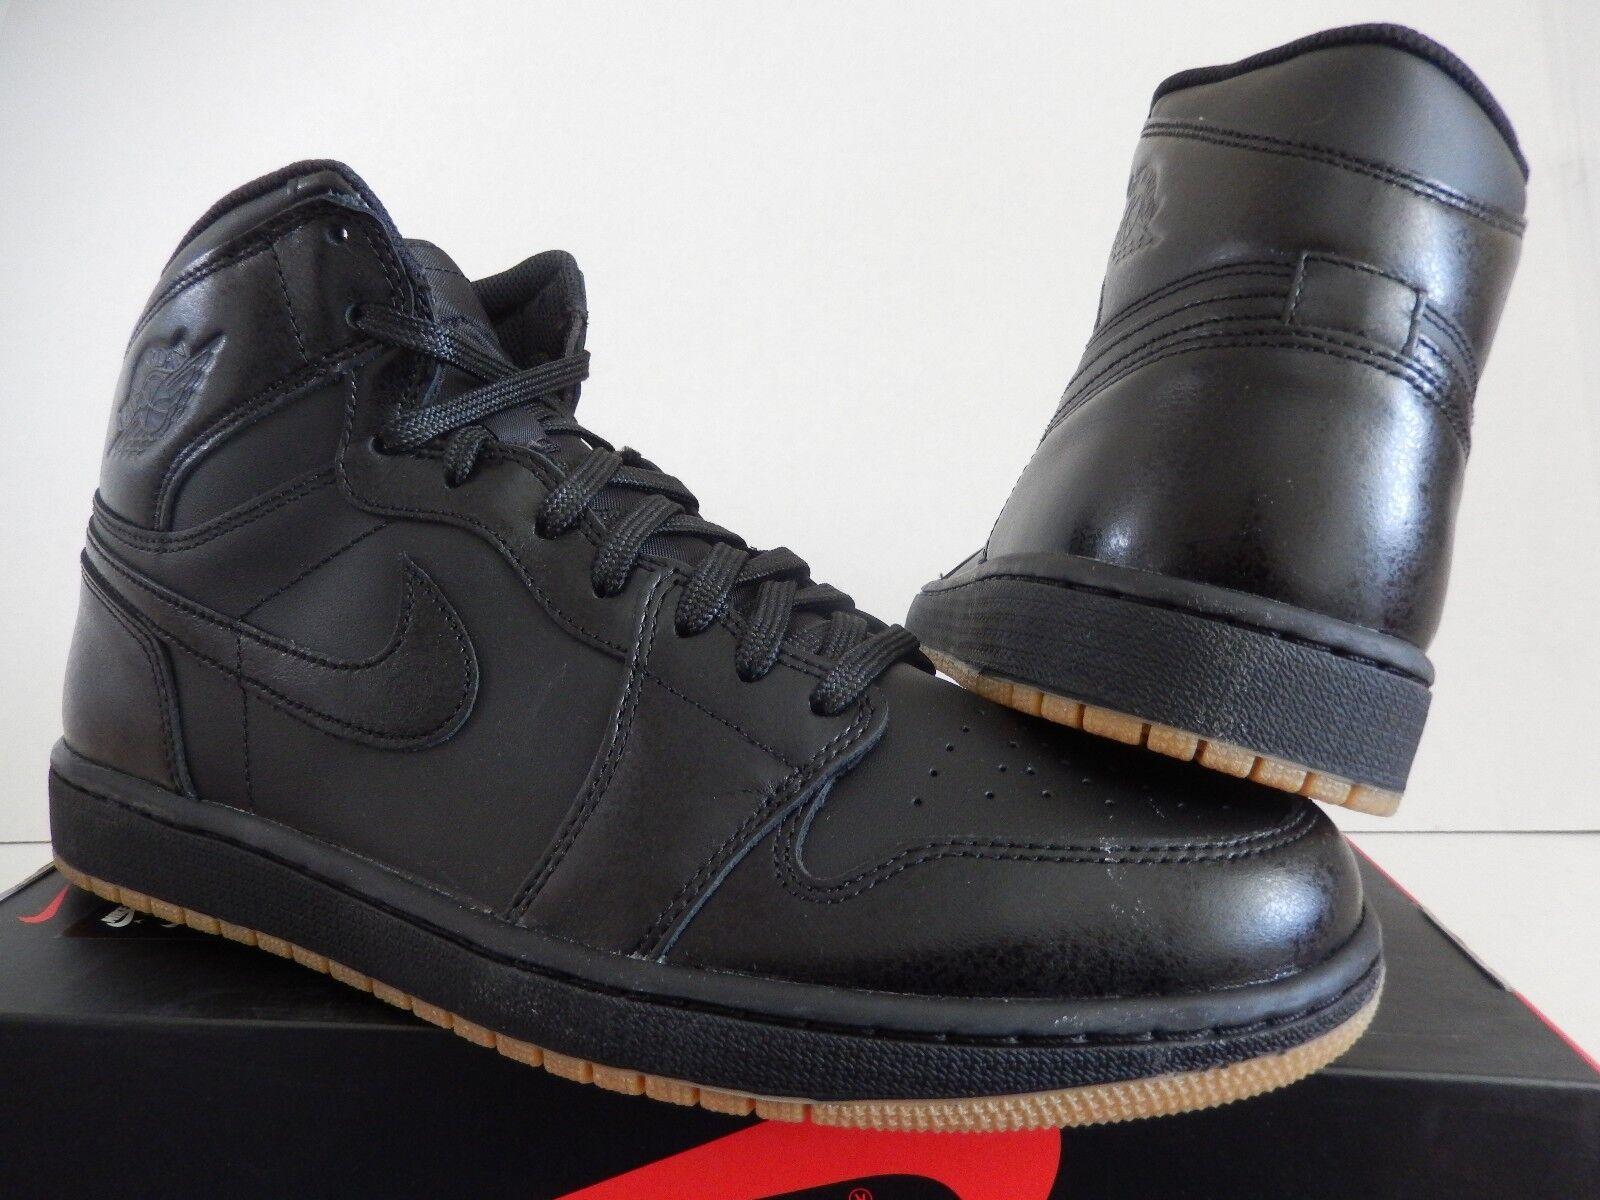 Nike air jordan 1 og 'alto og 1 nero-nero-gum castano sz 10 [555088-020] b08d58